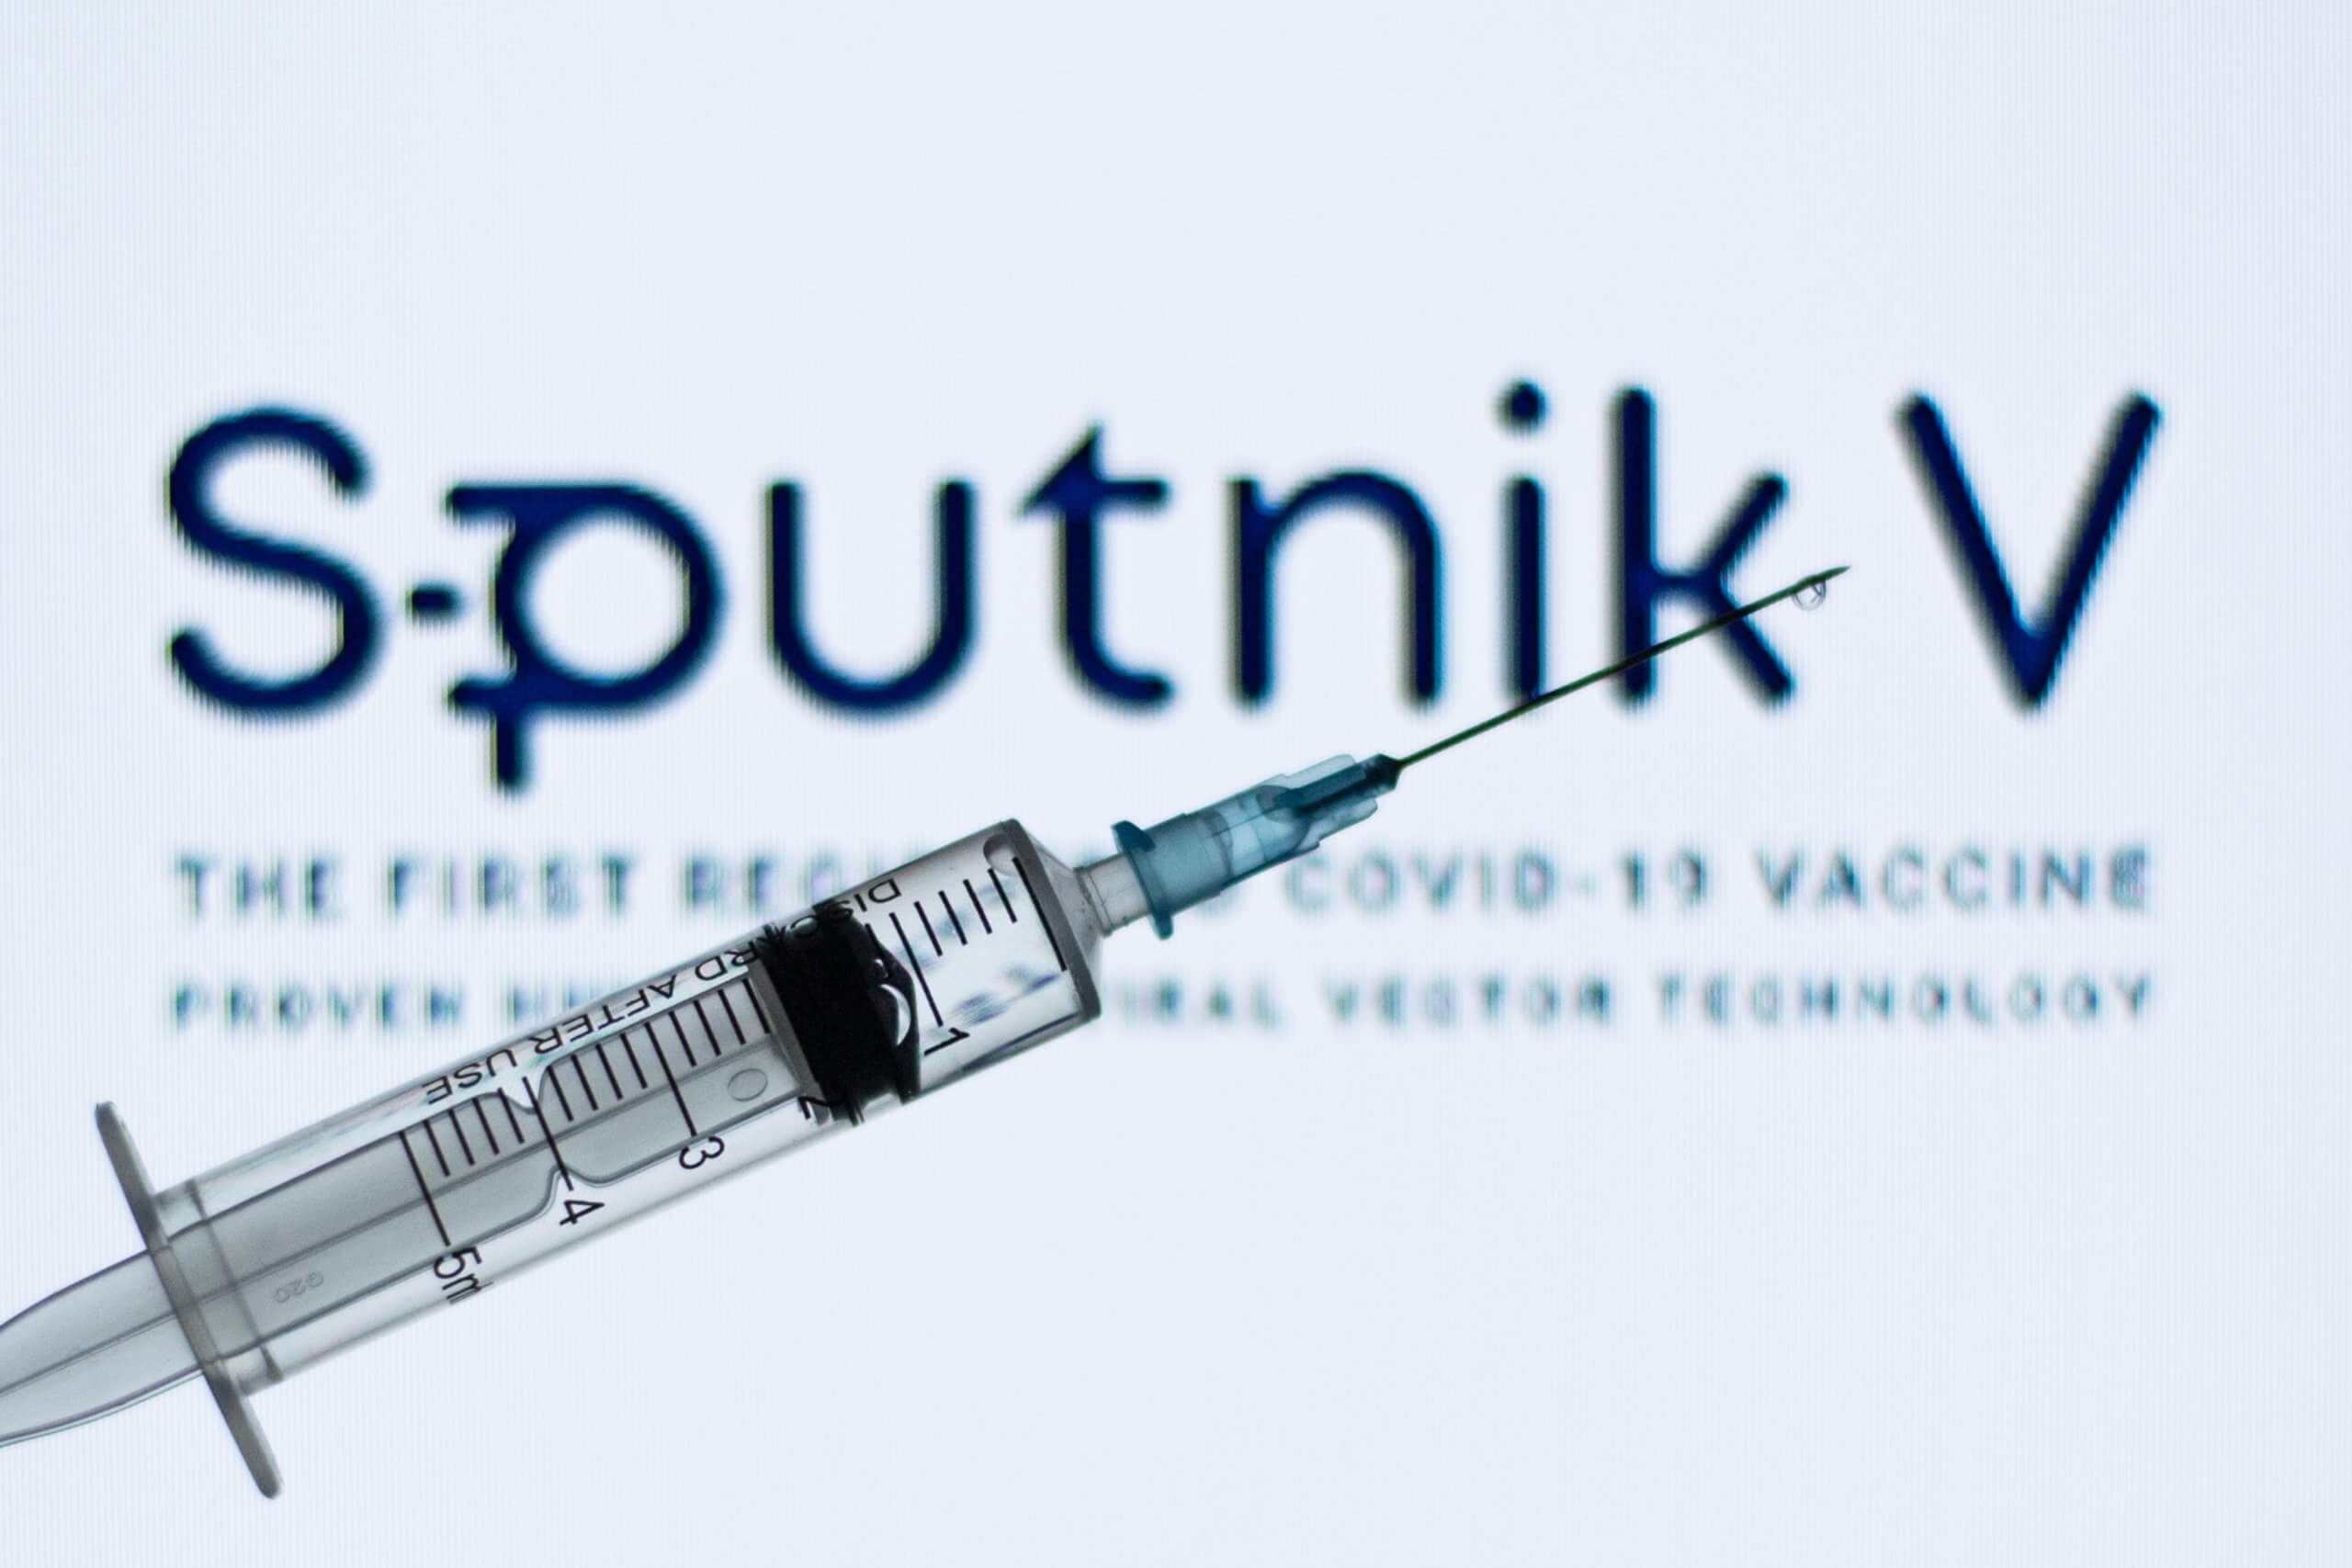 vaccinul giardia 2021